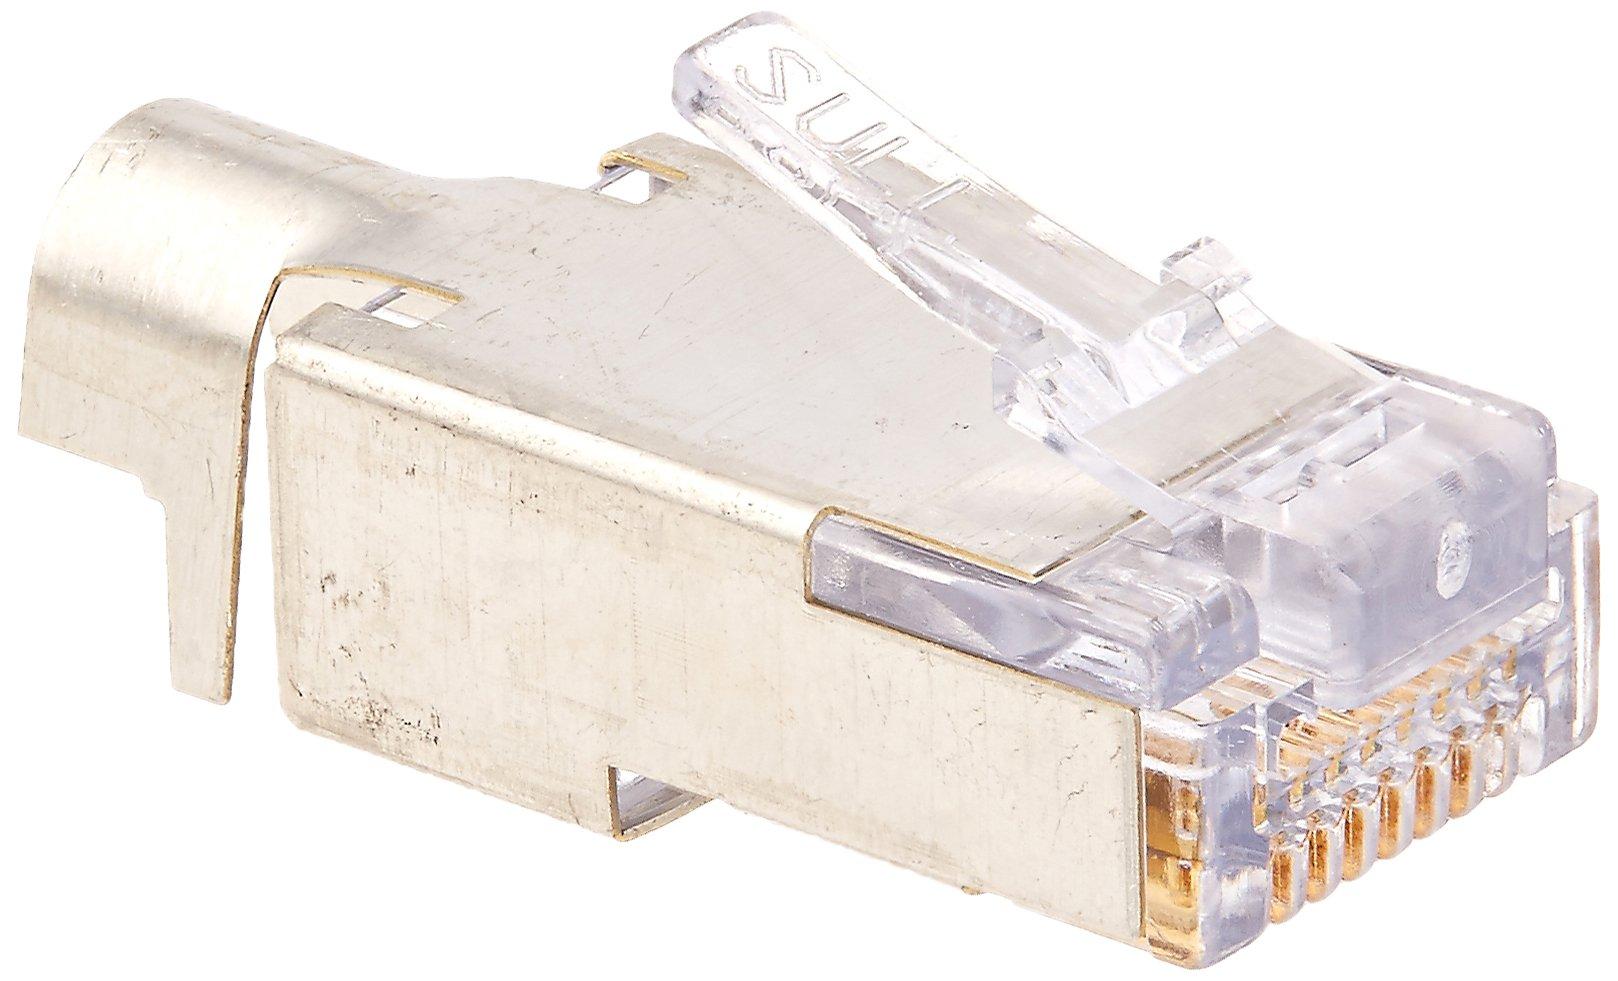 Platinum Tools 100022 EZ-RJ45 Shielded Cat5e/6 External Ground, 50-Pack